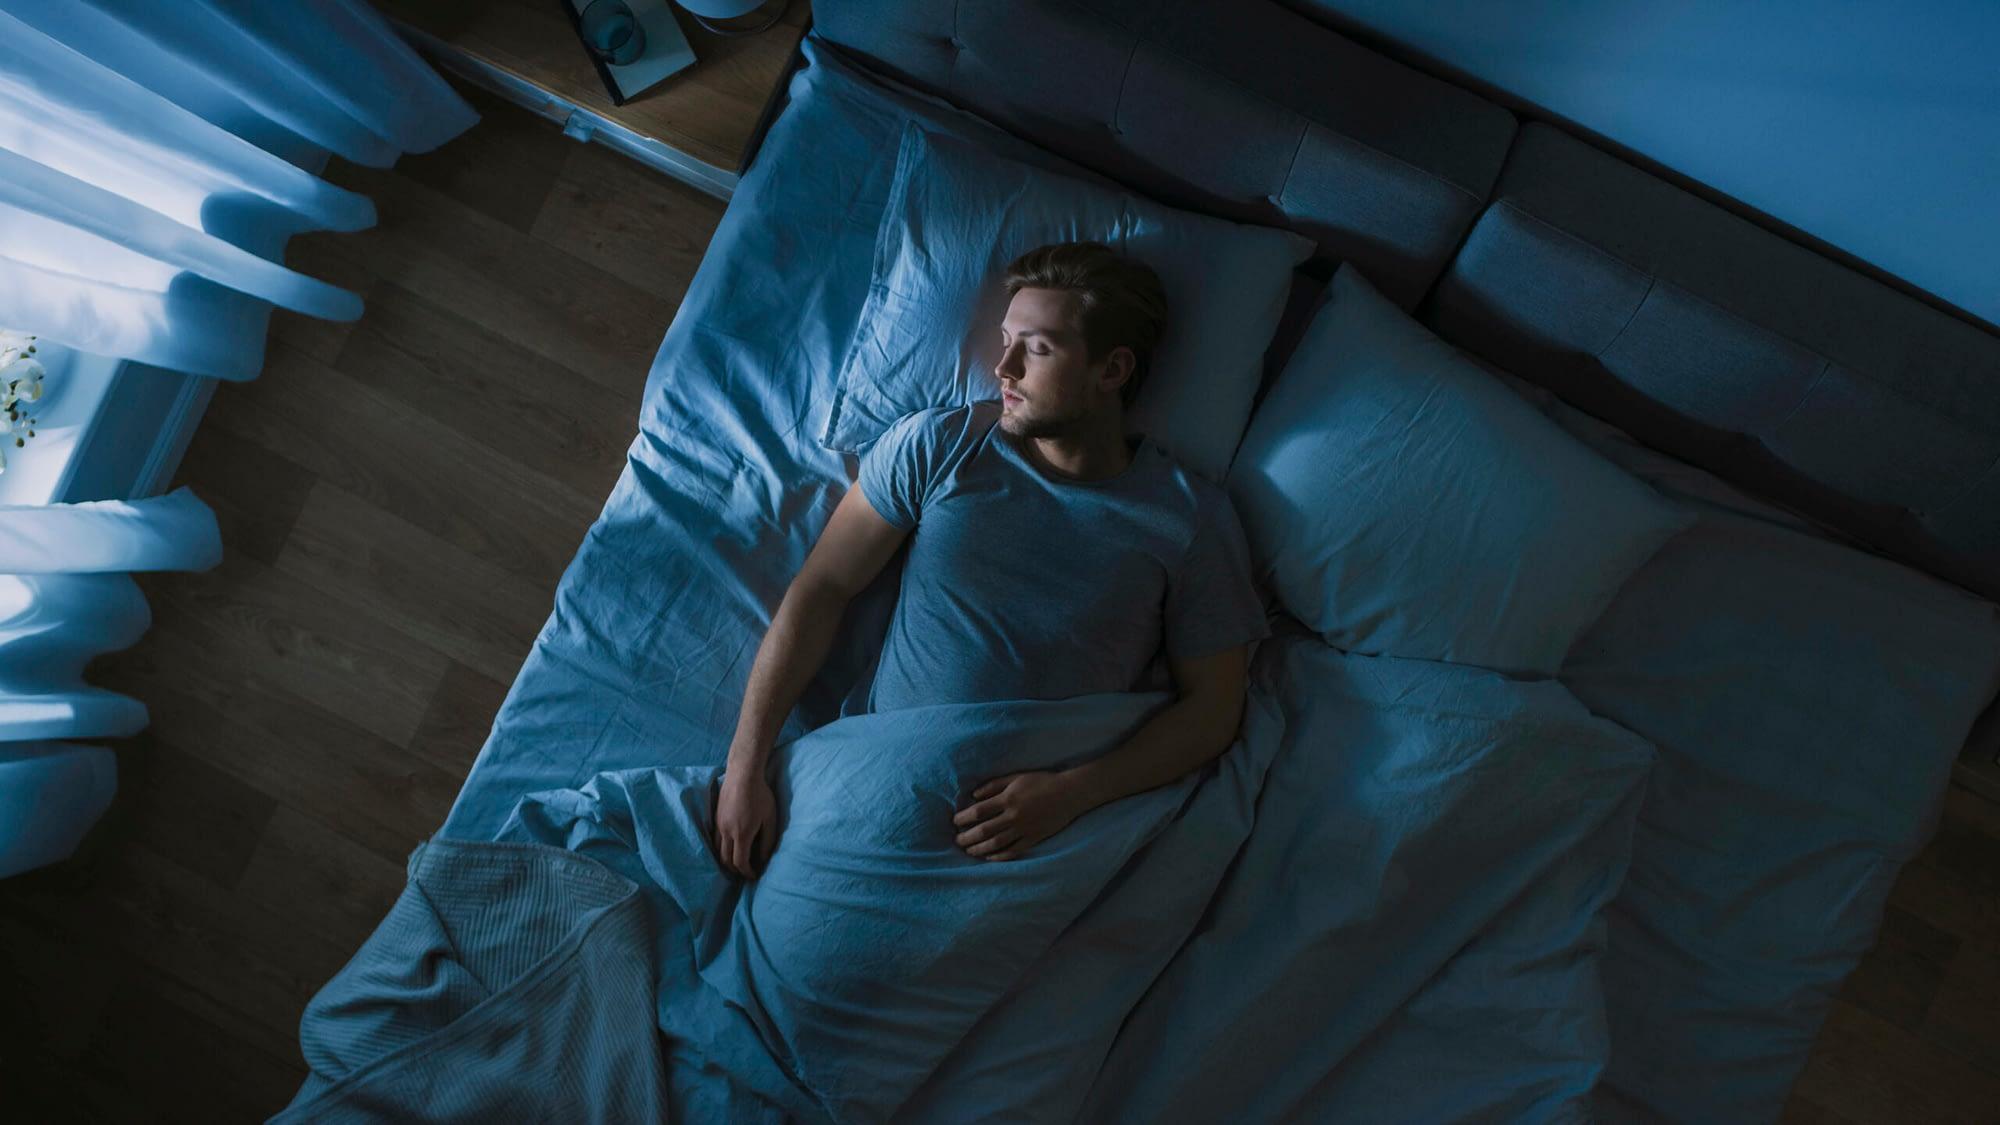 Man having a restful sleep